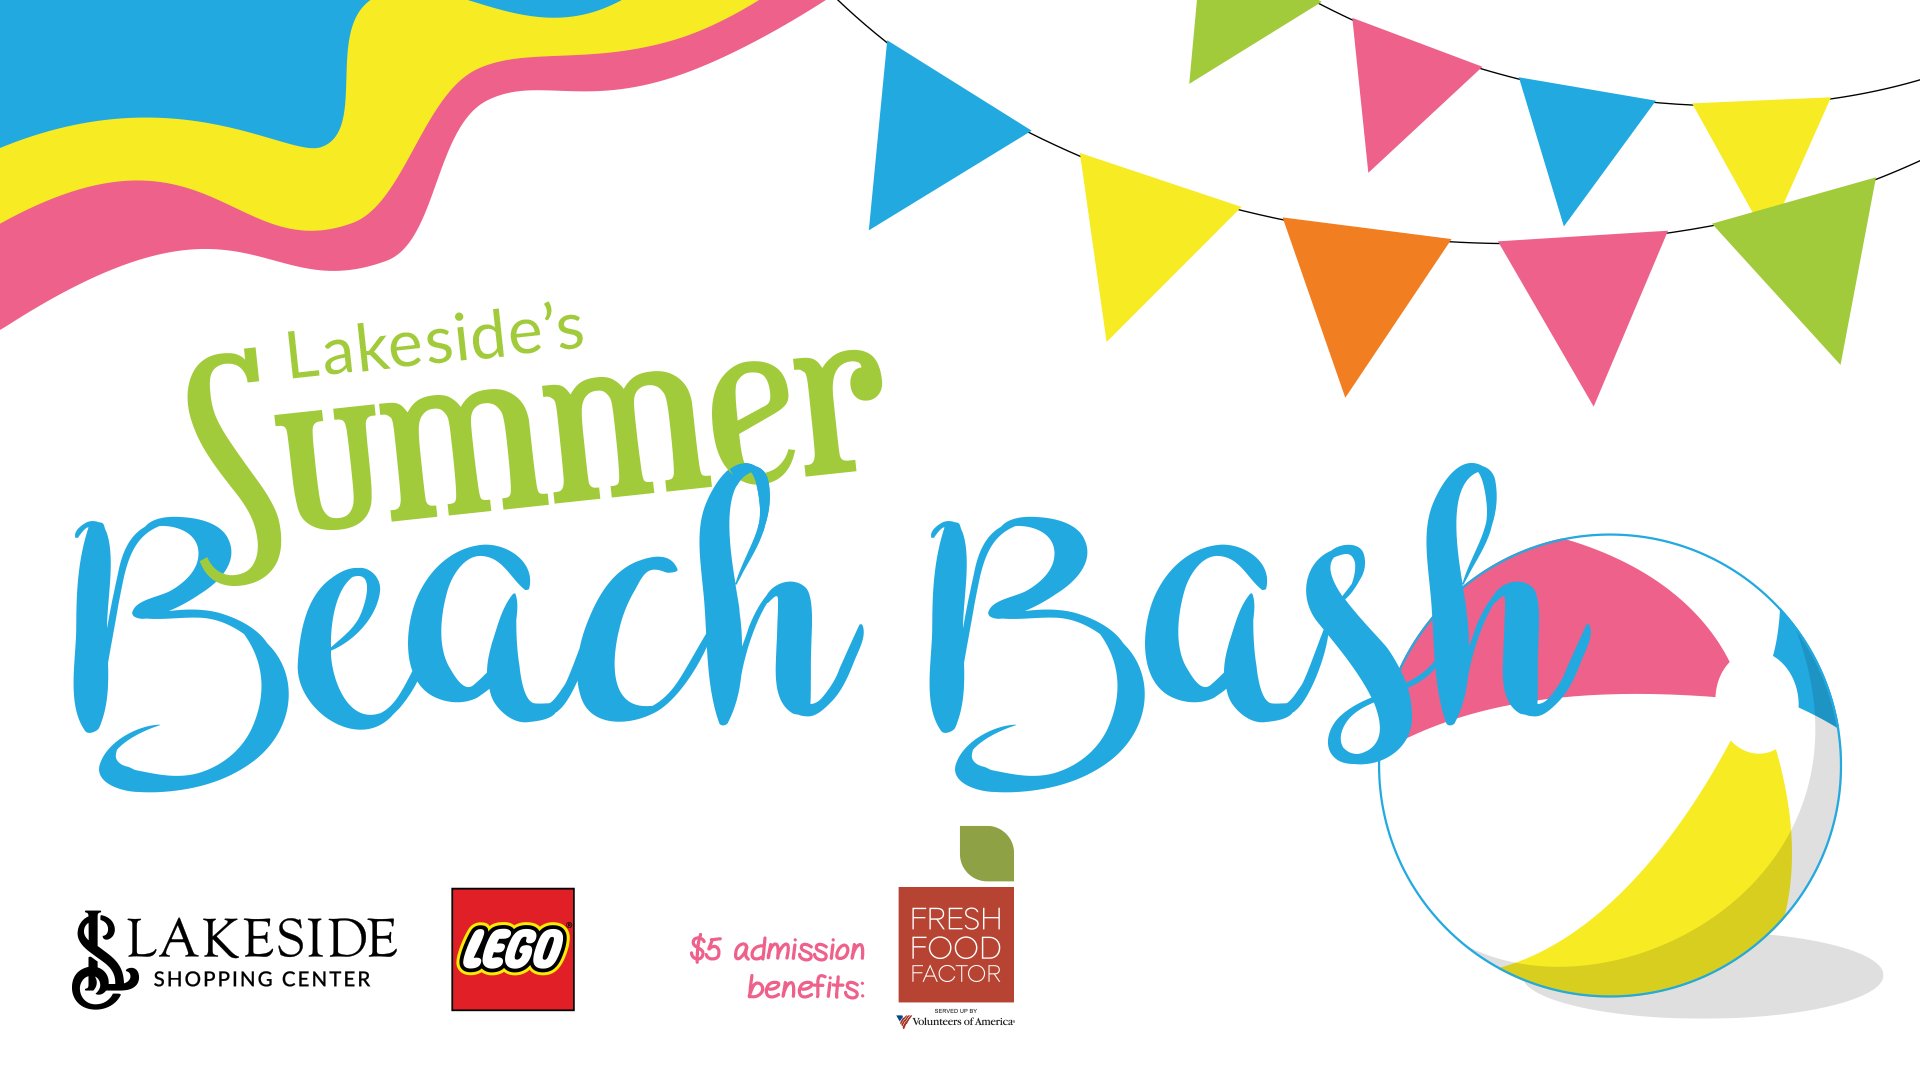 LS_summerbeachbash_SM-Fbevent.png